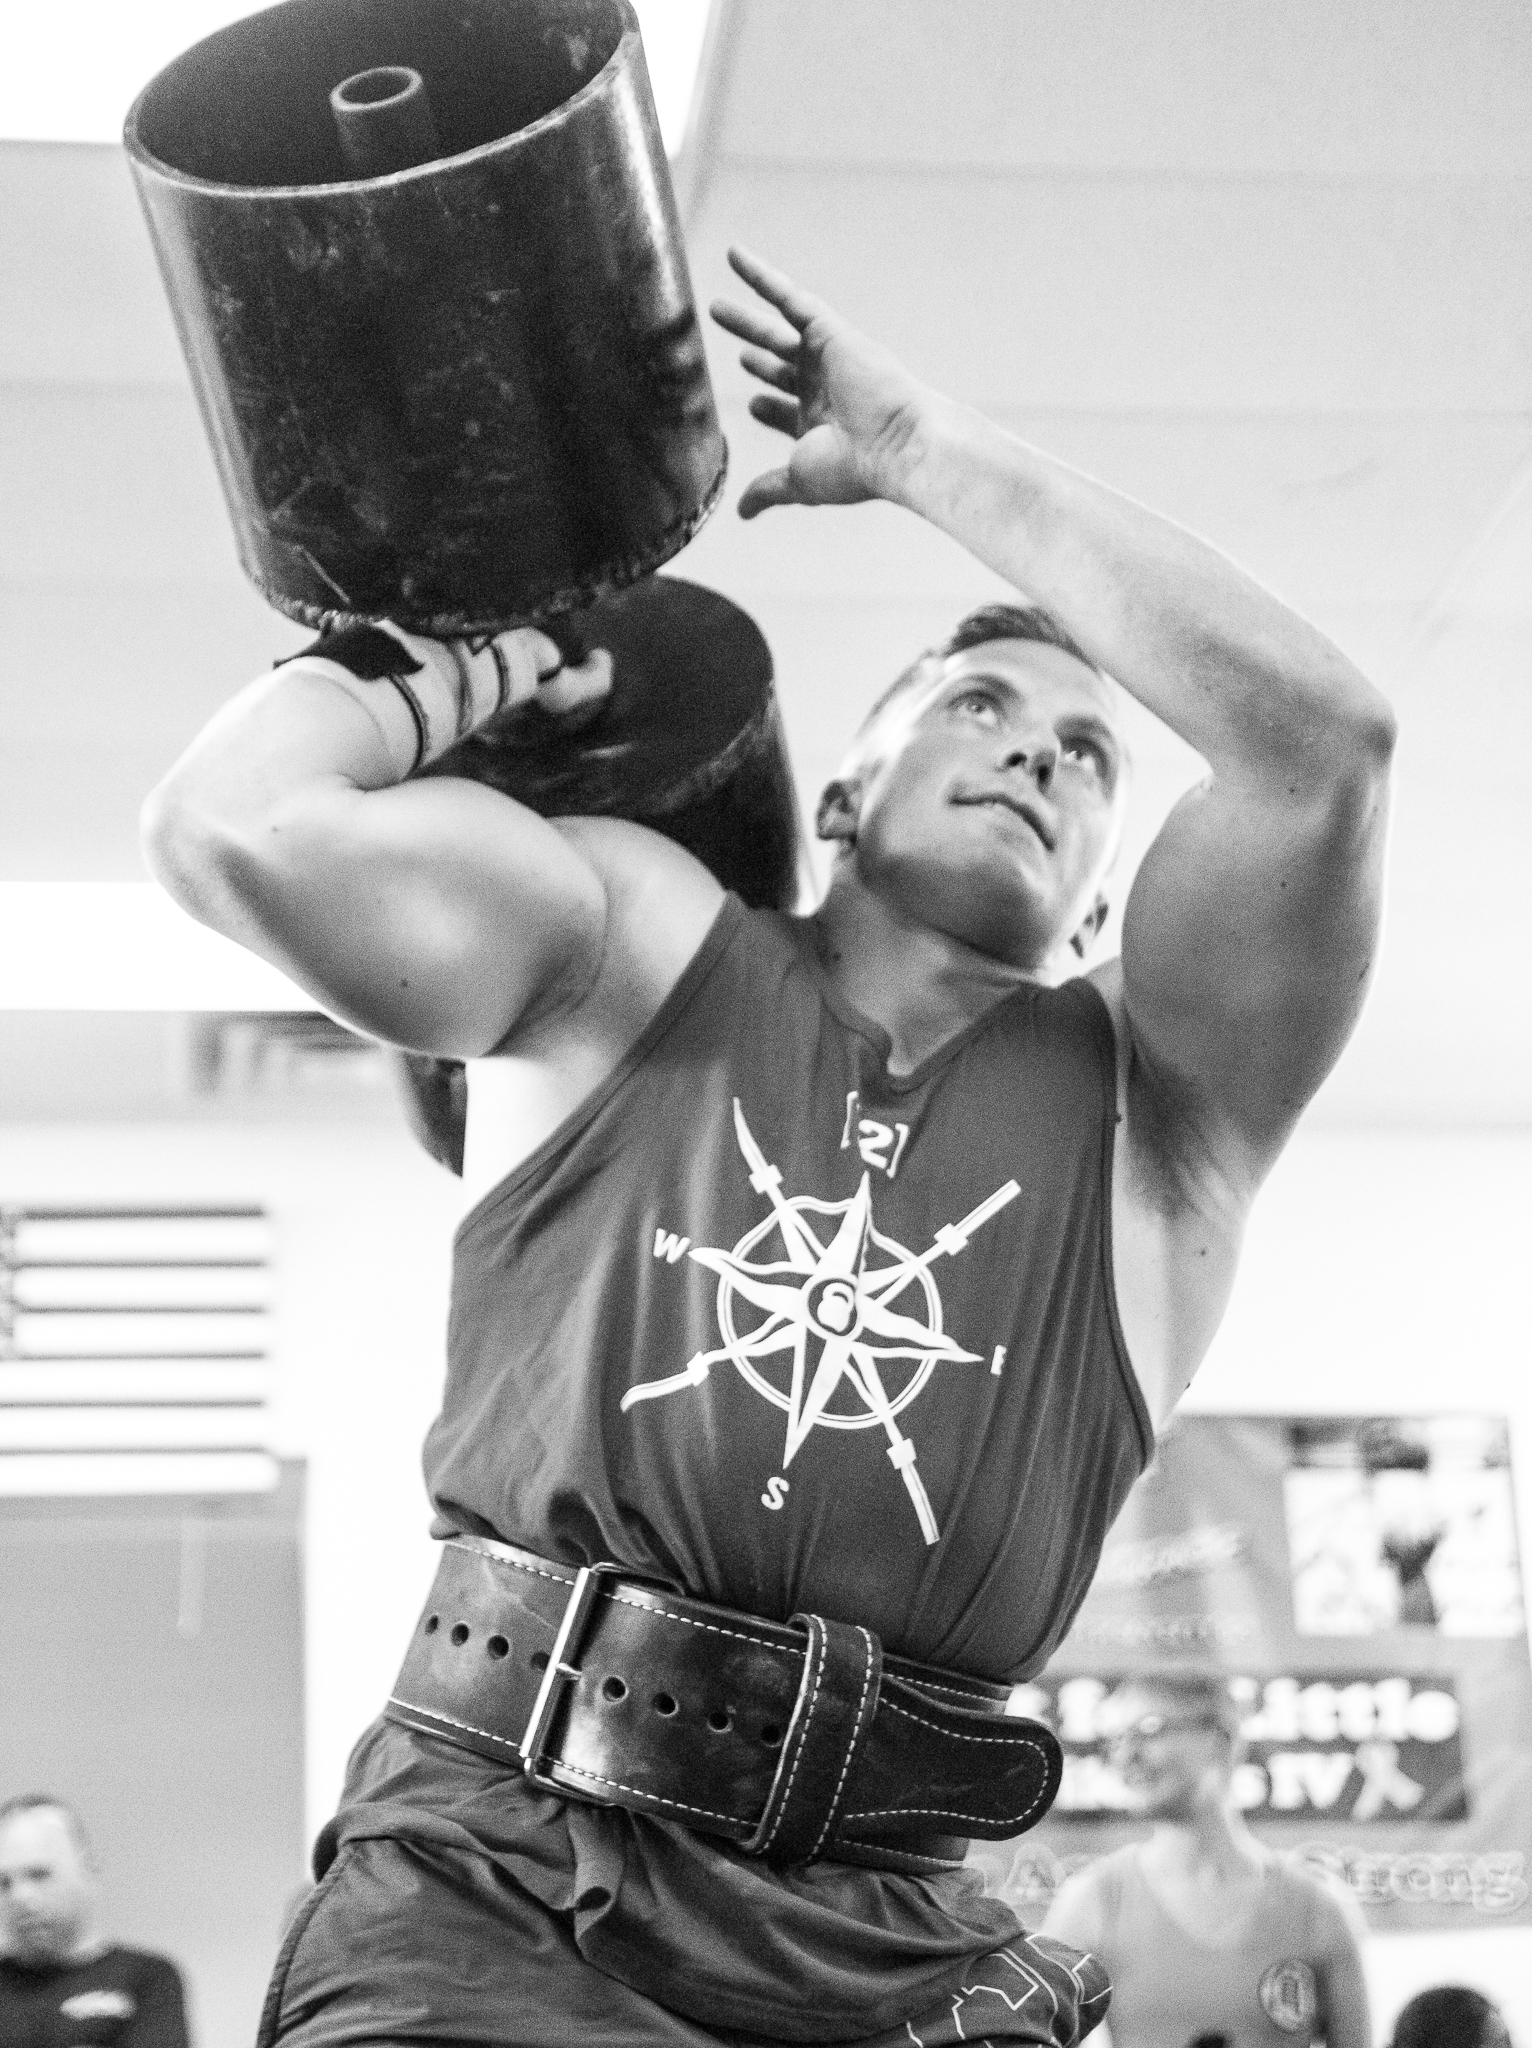 hurt-performance-4th-annual-little-viking-charity-washingtonville-new-york-strongman-eveyrdaylifters-vp (181 of 348).jpg